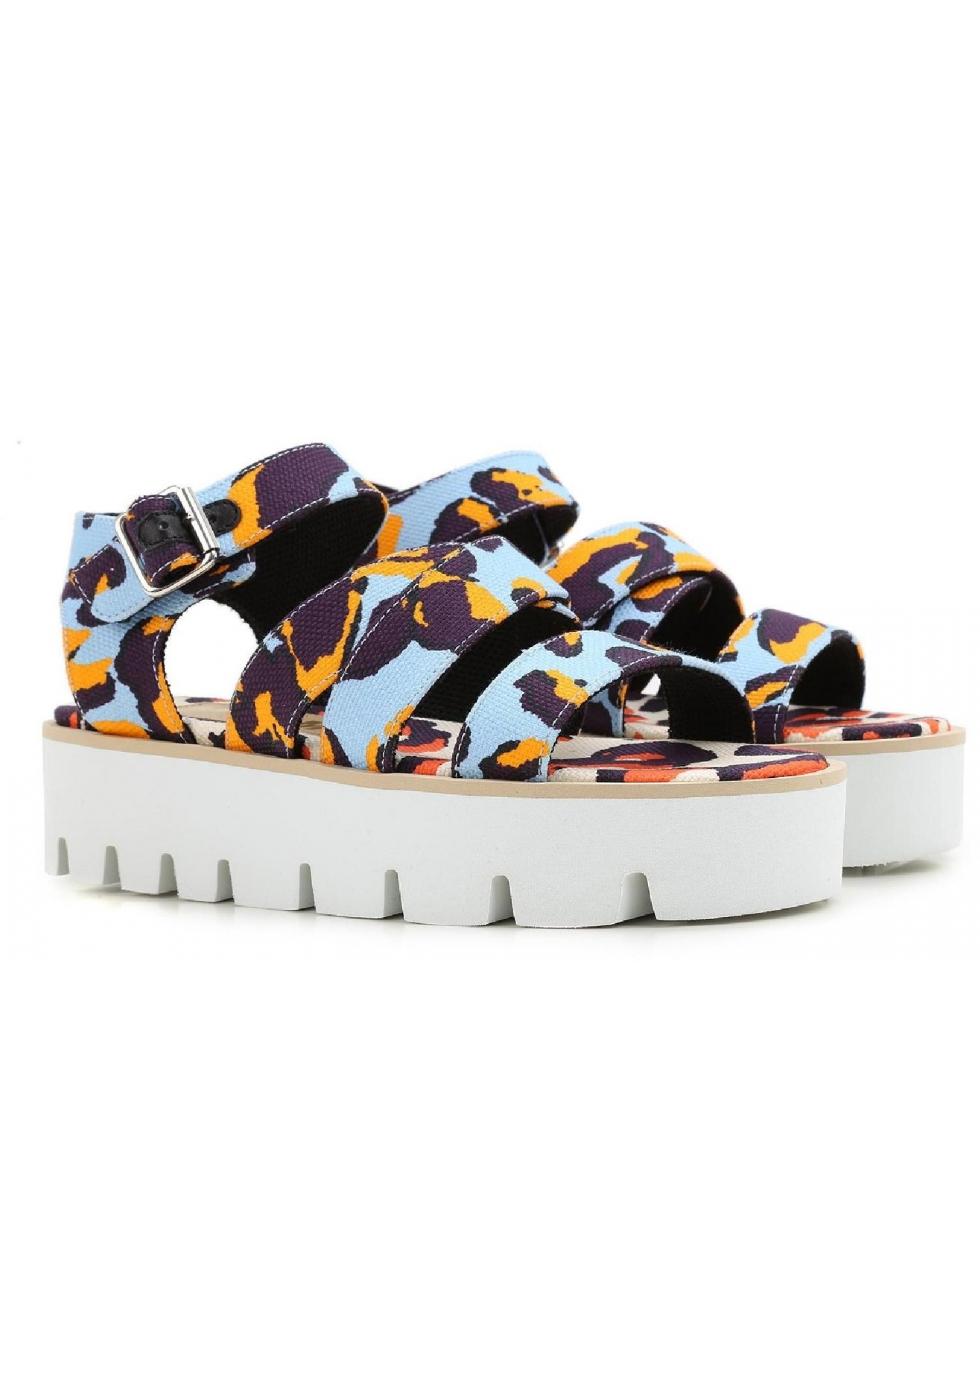 Outlet sandali MSGM originali - Italian Boutique 182c765ae19